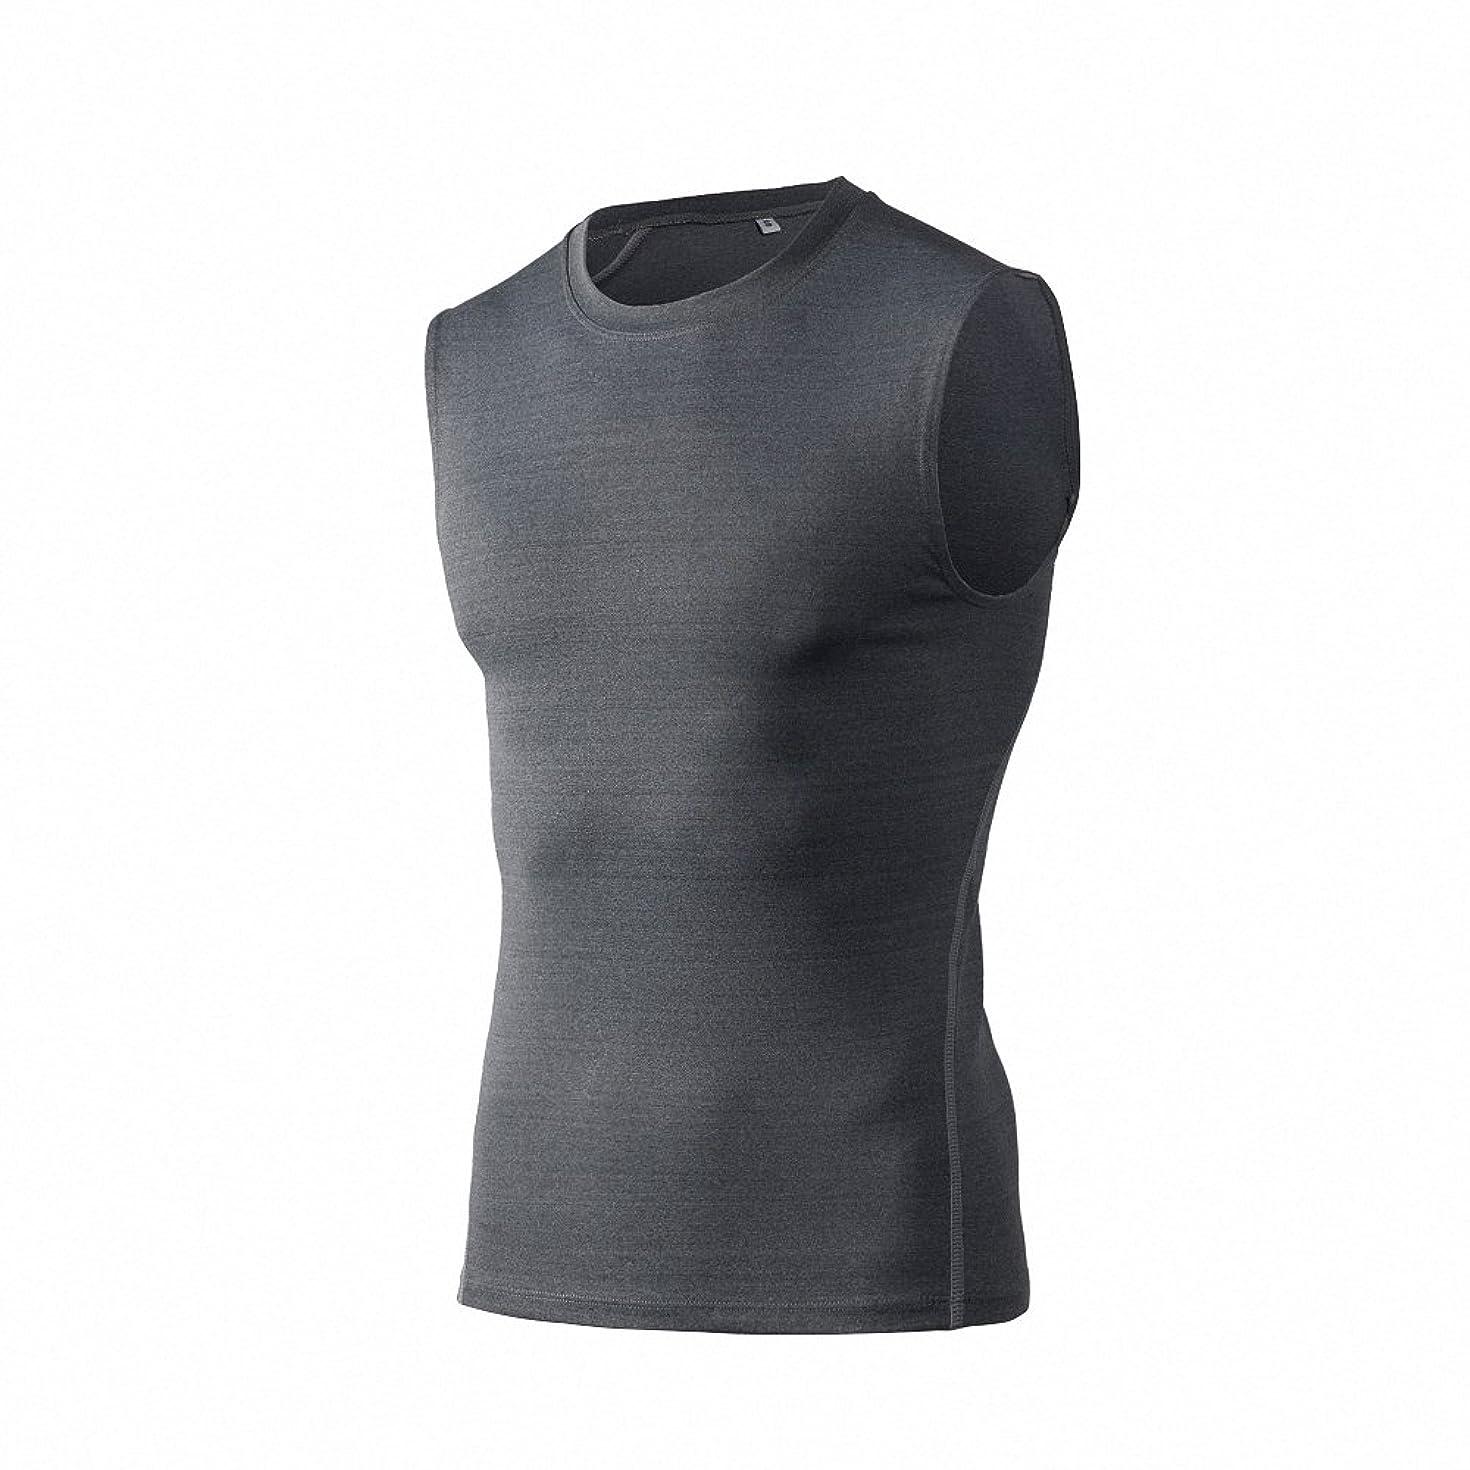 Maoko Men's Compression Sleeveless Baselayer Workout Tank Top Shirt